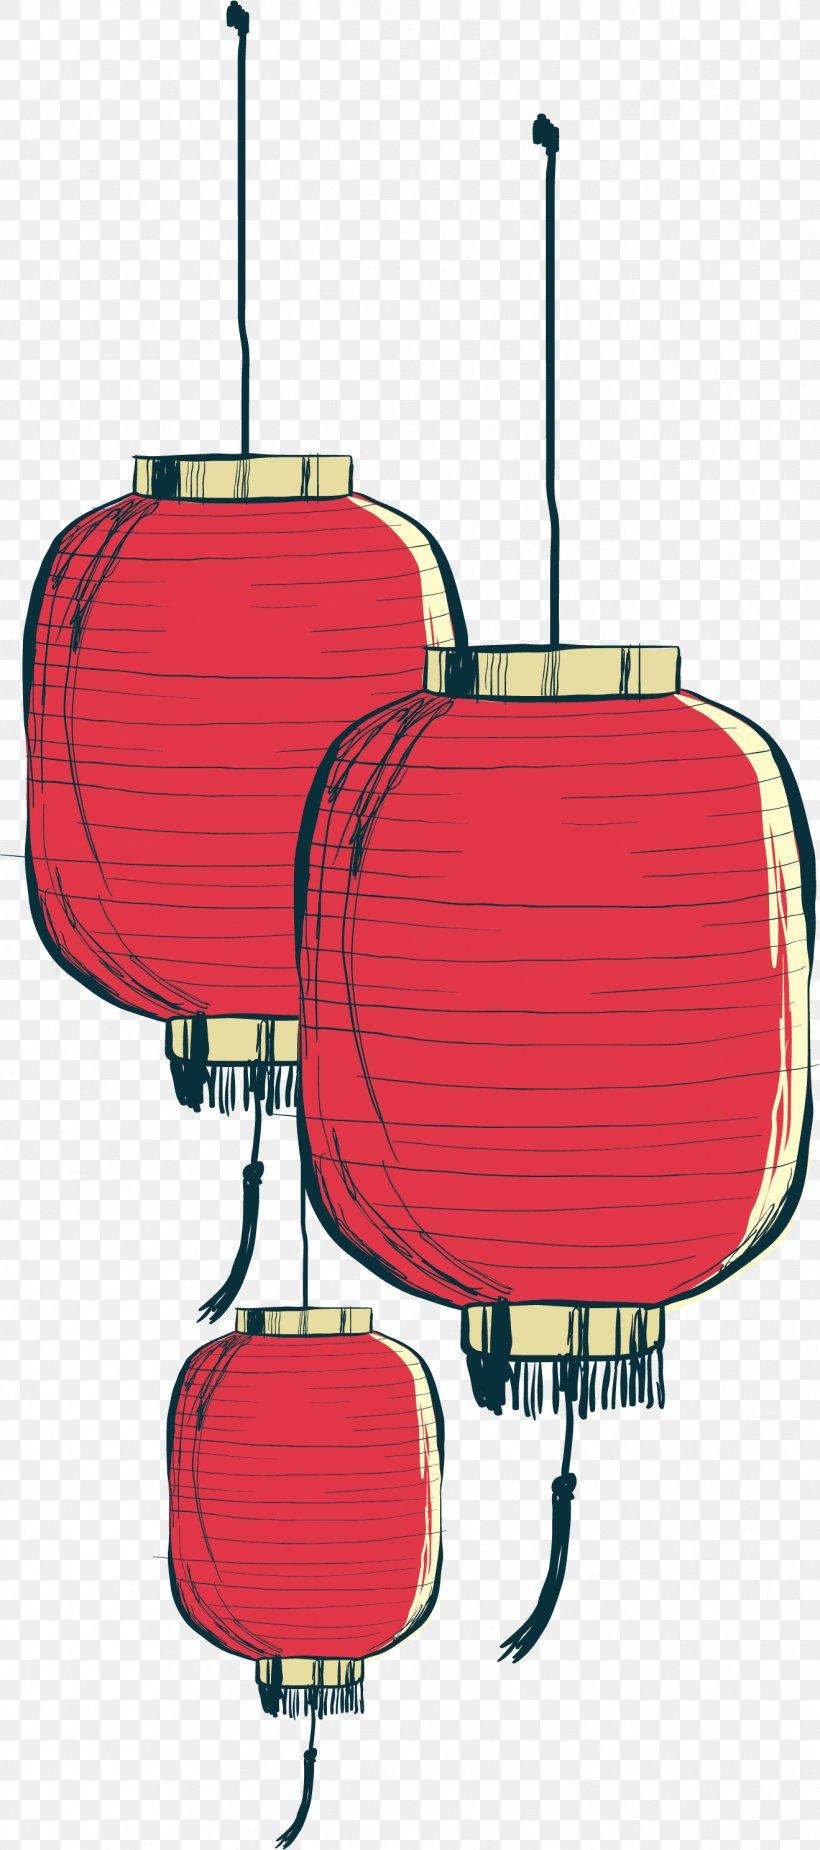 Paper Lantern, PNG, 1319x2977px, China, Chinese New Year, Festival, Illustration, Lantern Download Free